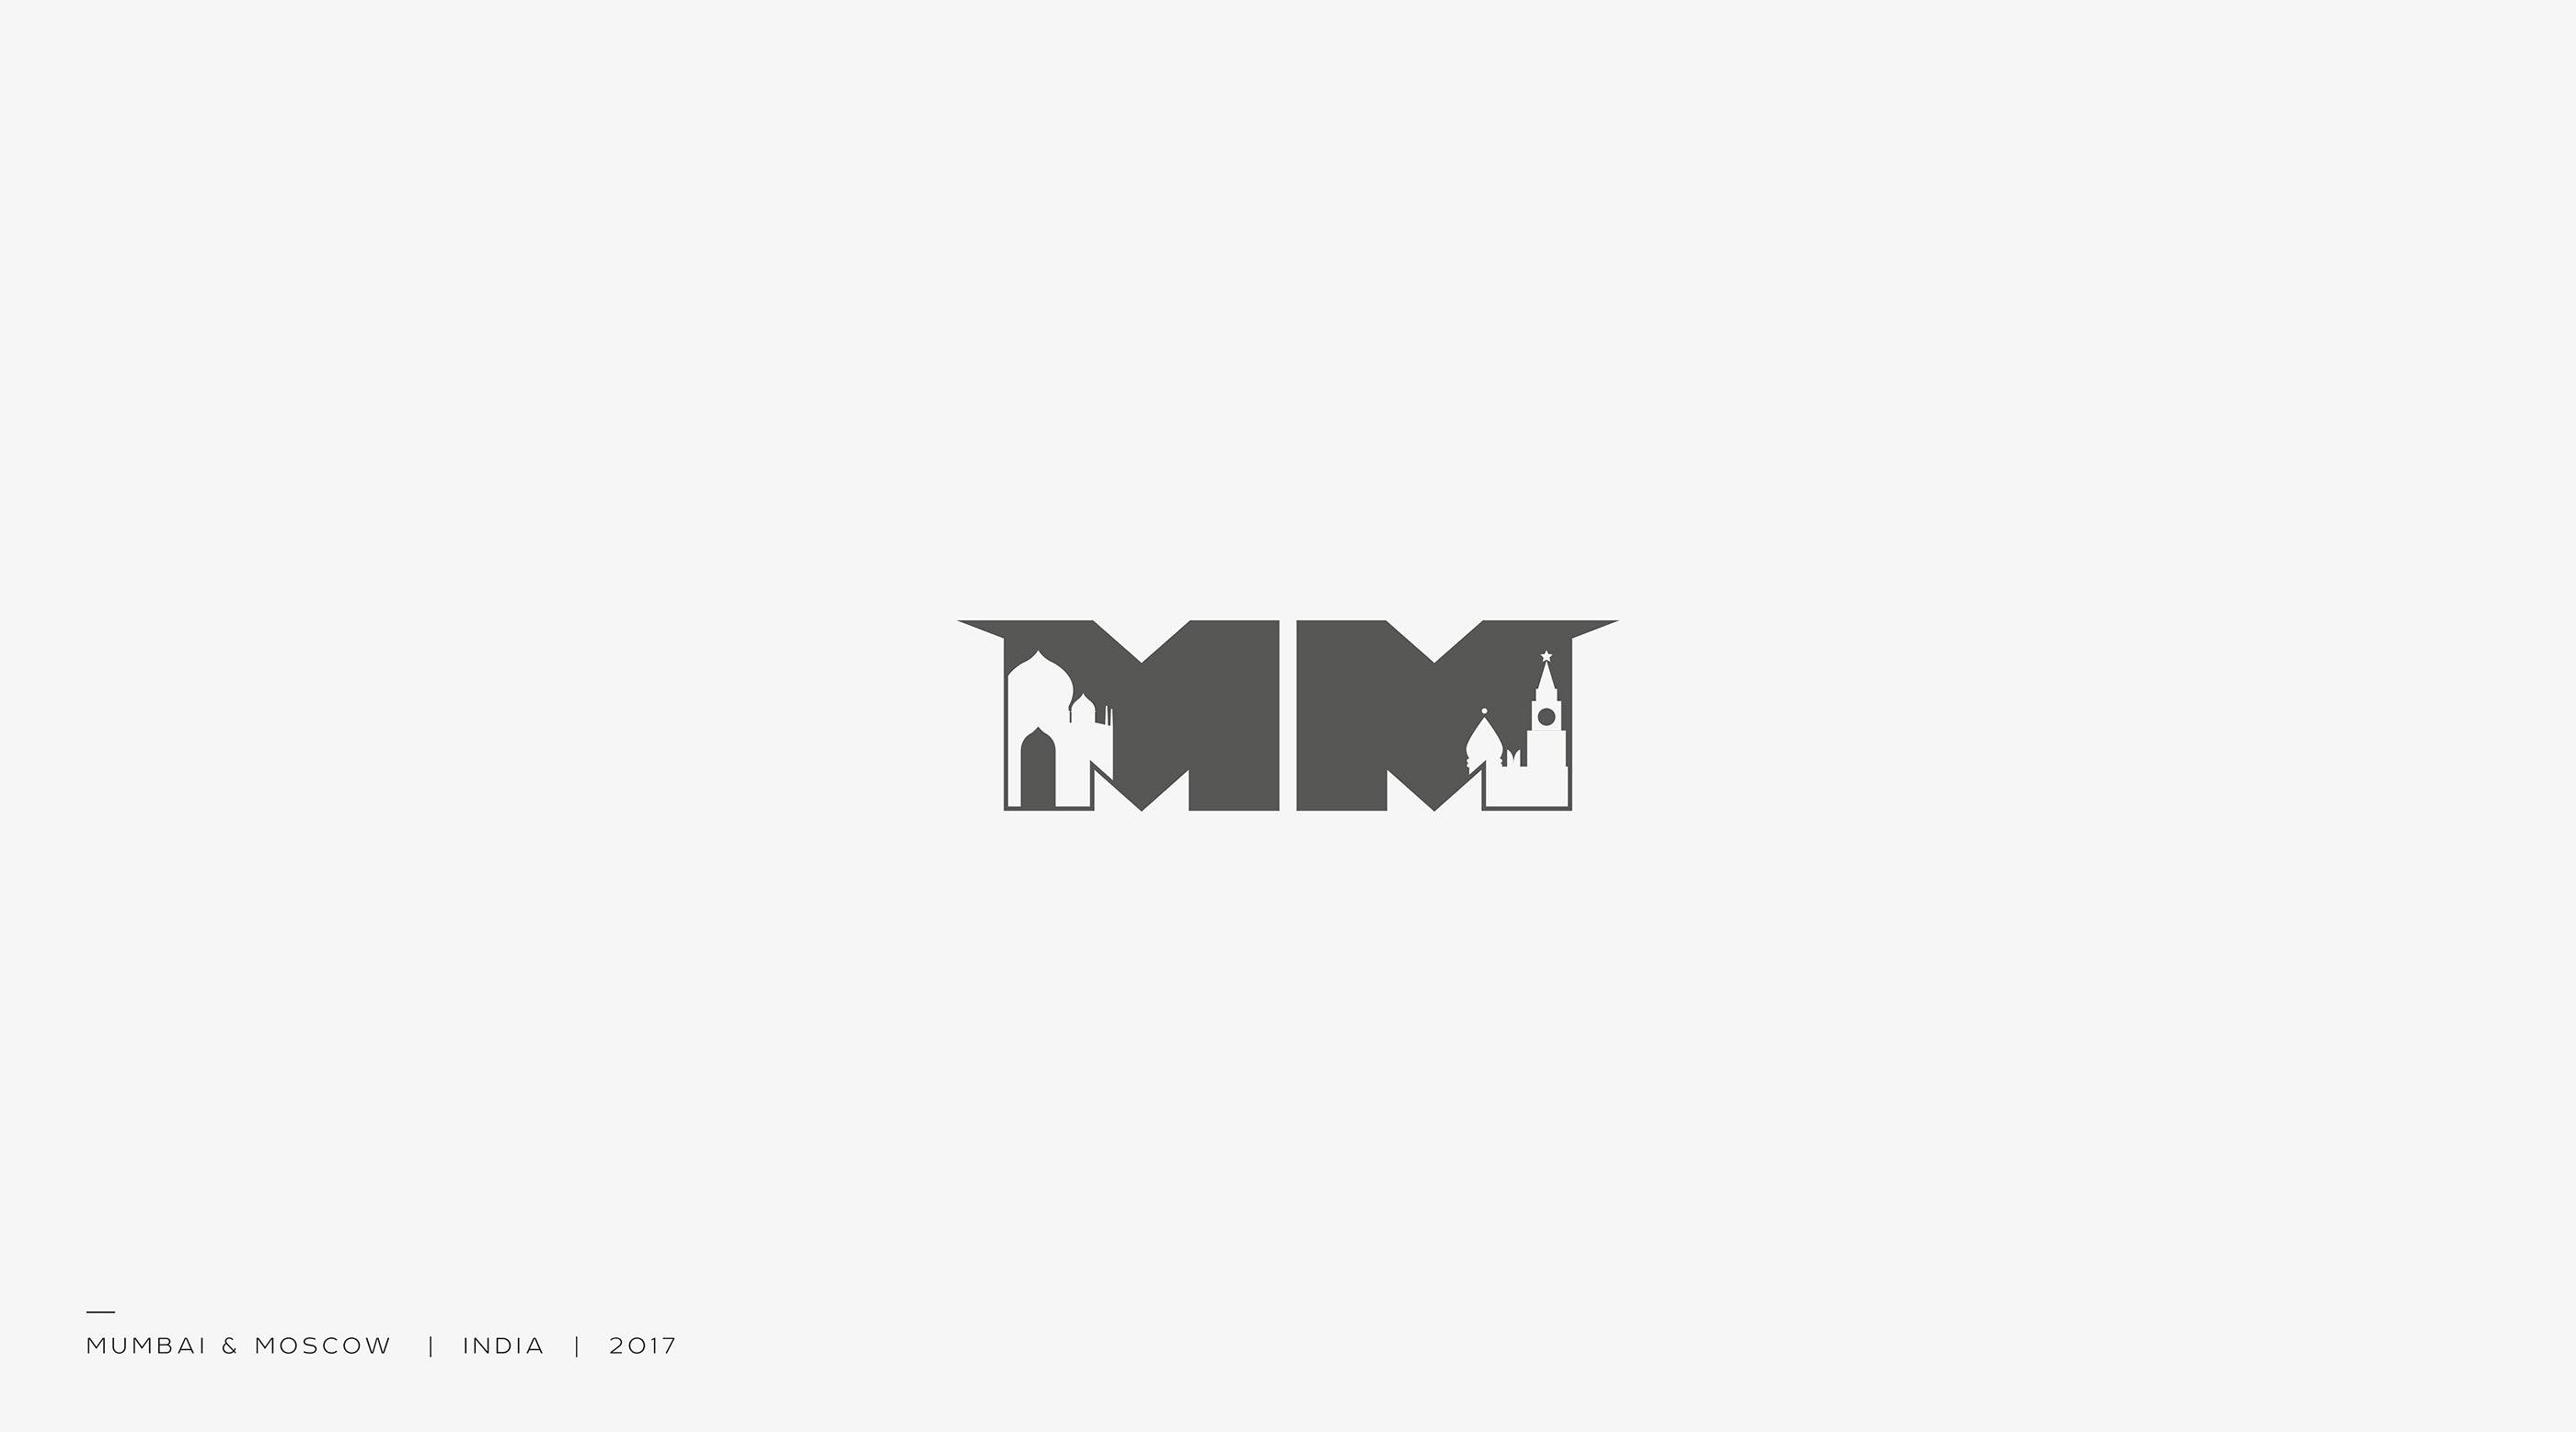 Ashot Tatyan标志设计作品